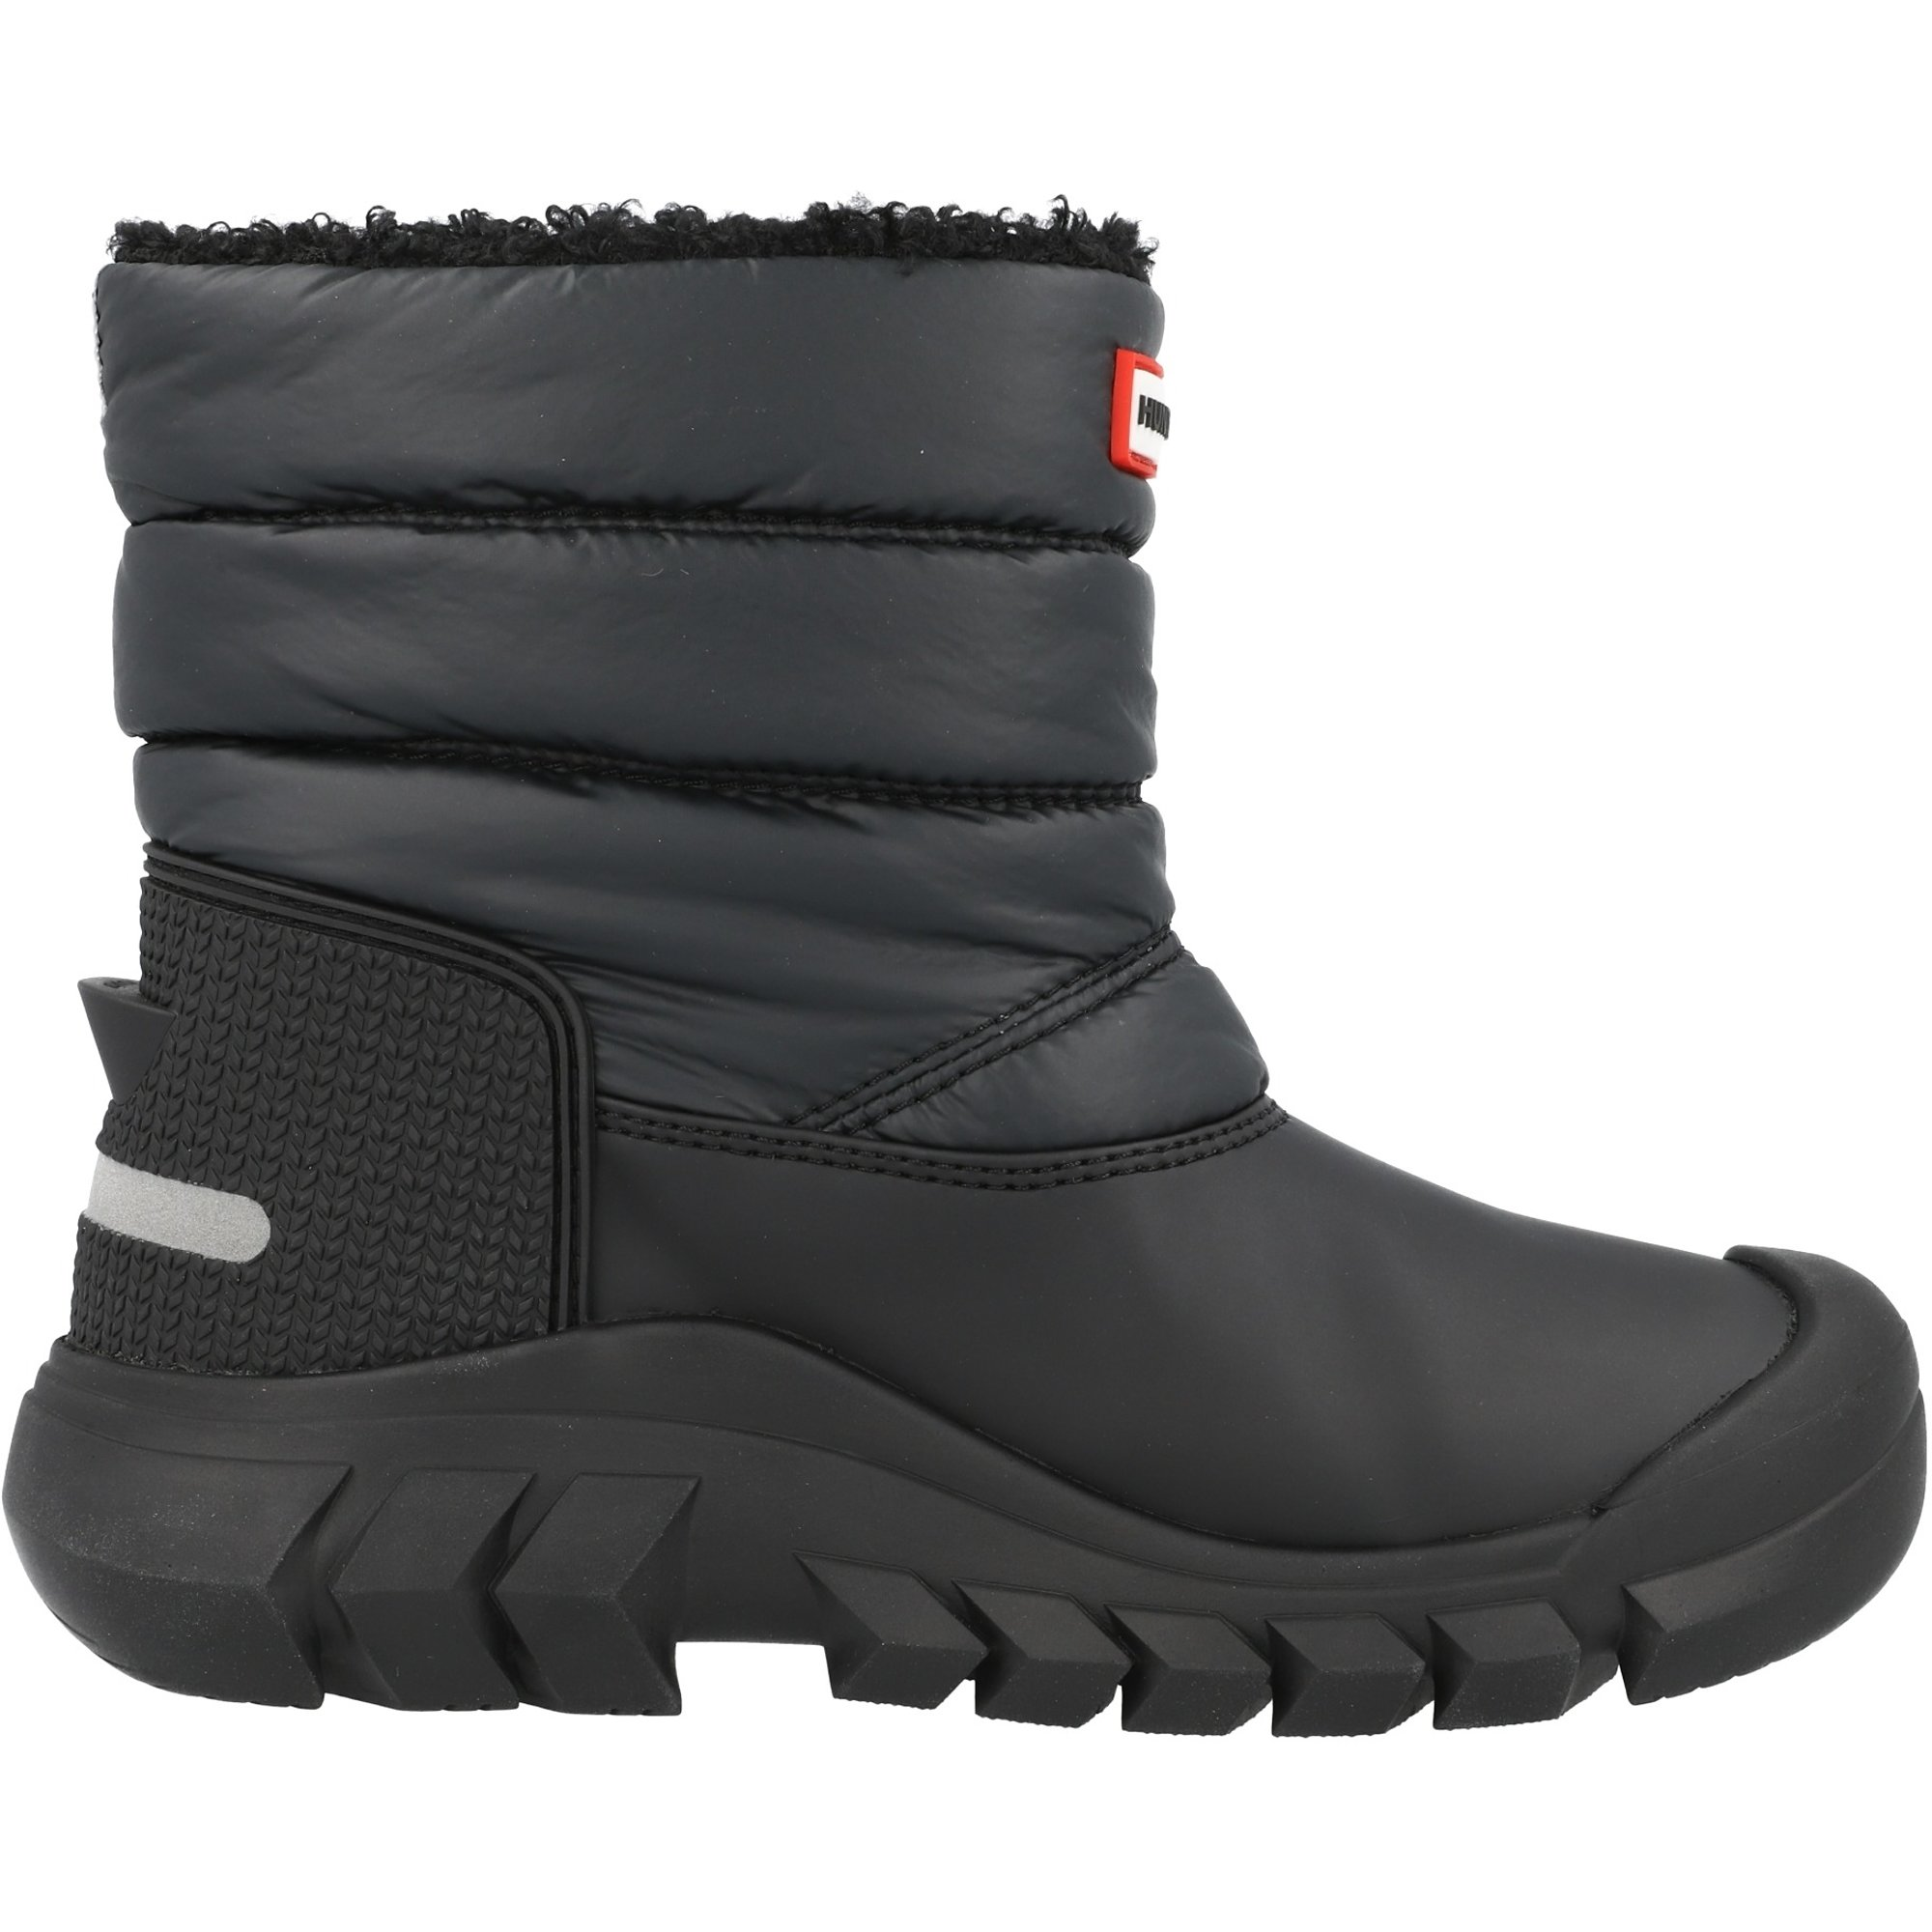 Hunter Original Kids Snow Boots Black Nylon